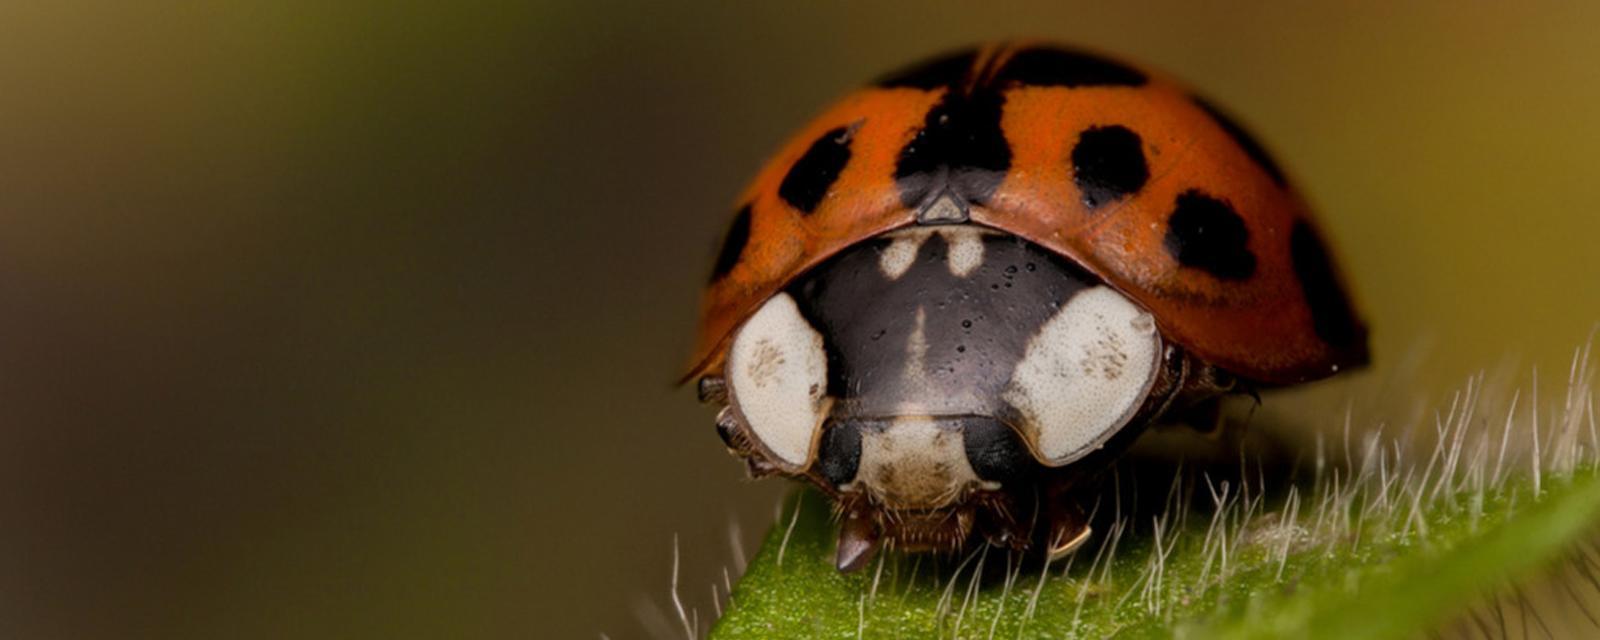 Earth - Secrets of the harlequin ladybird revealed